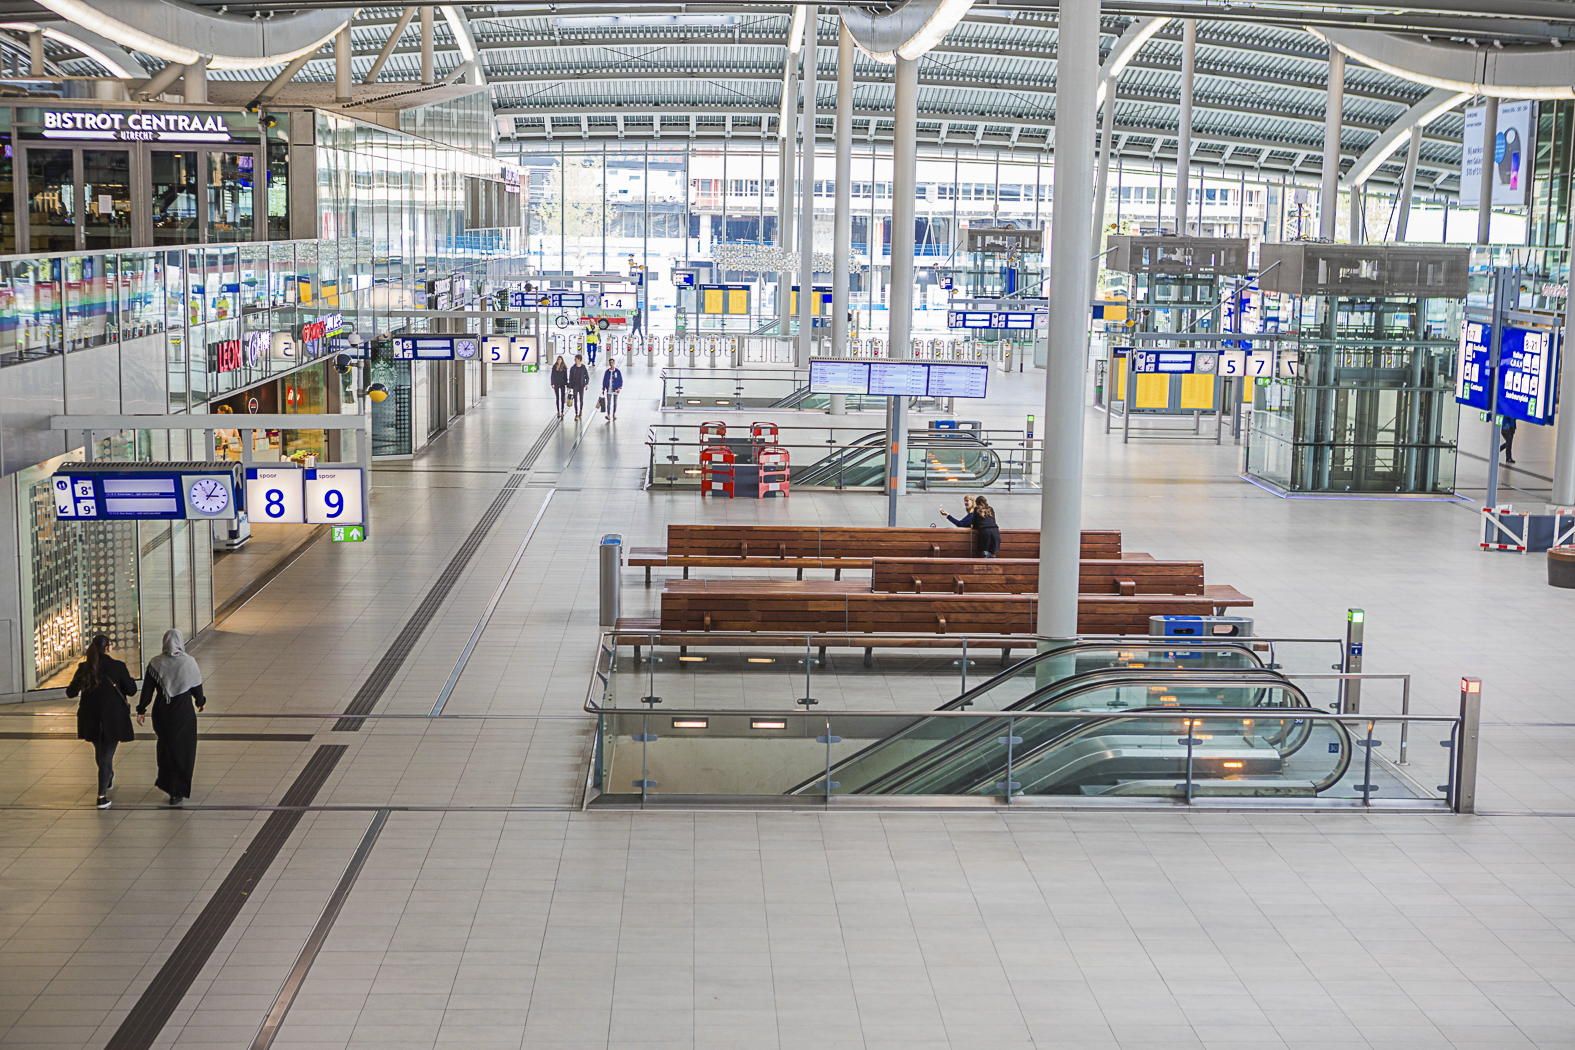 20190528-20190528-Station-Utrecht-CS-verlaten-8